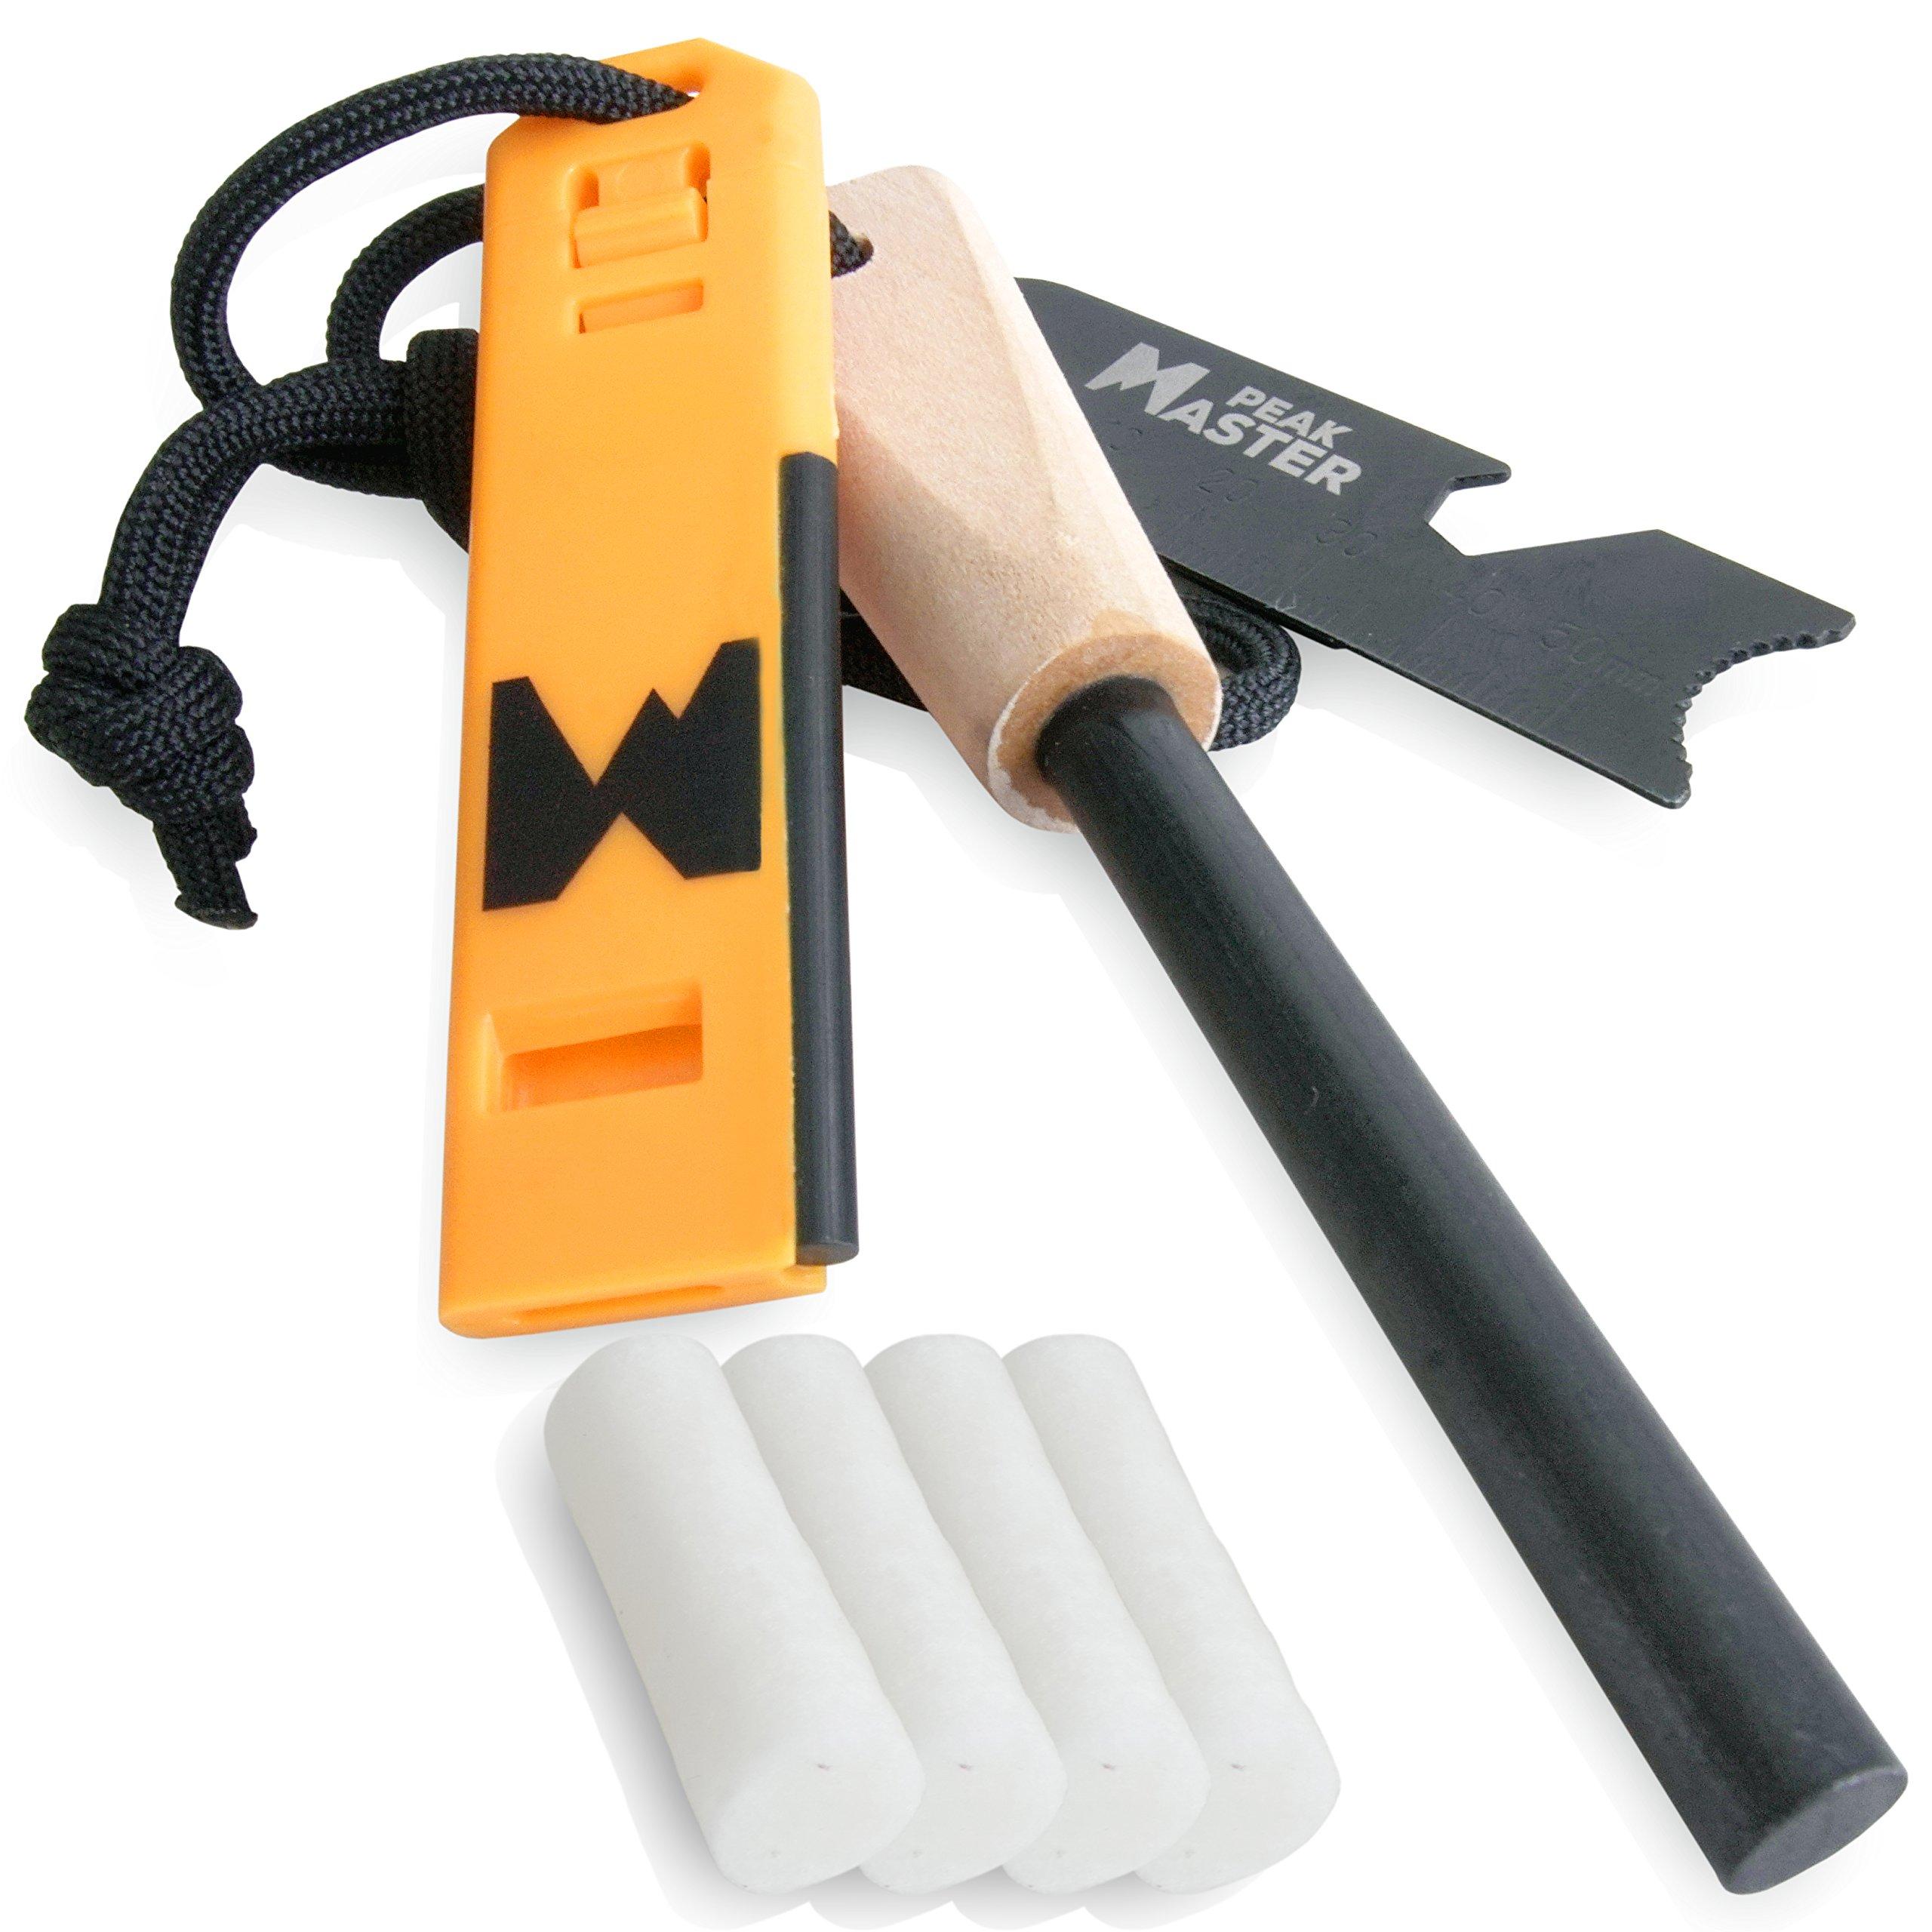 PEAK MASTER Emergency Fire Steel | 1/2'' 5/16'' Thick Ferro Rod Wood Handle + Survival Whistle Fire Starter, Cotton Tinder Multi-Tool Striker